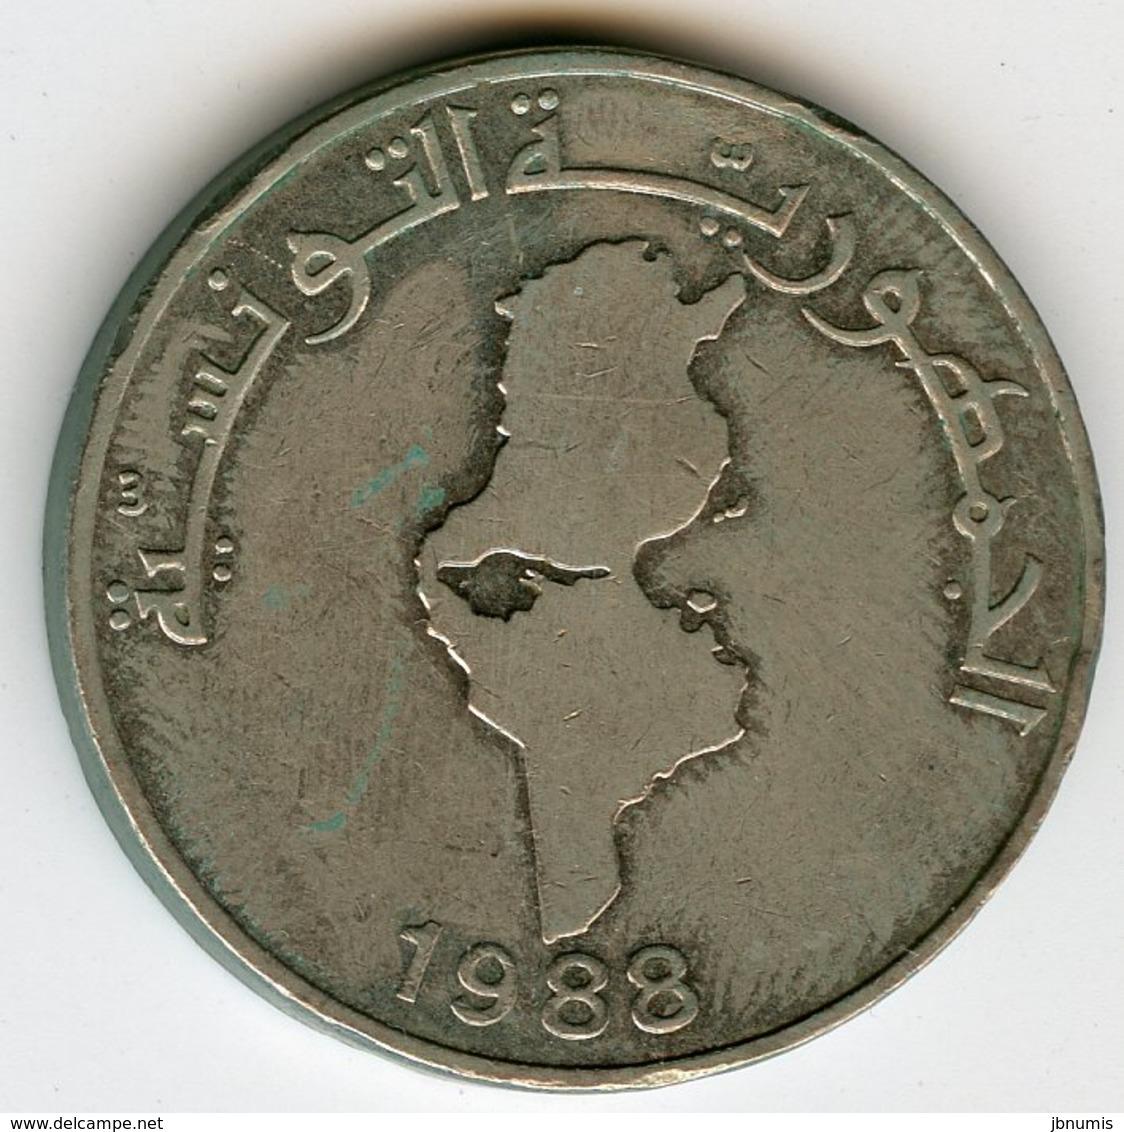 Tunisie Tunisia 1 Dinar 1988 FAO KM 319 - Tunisie